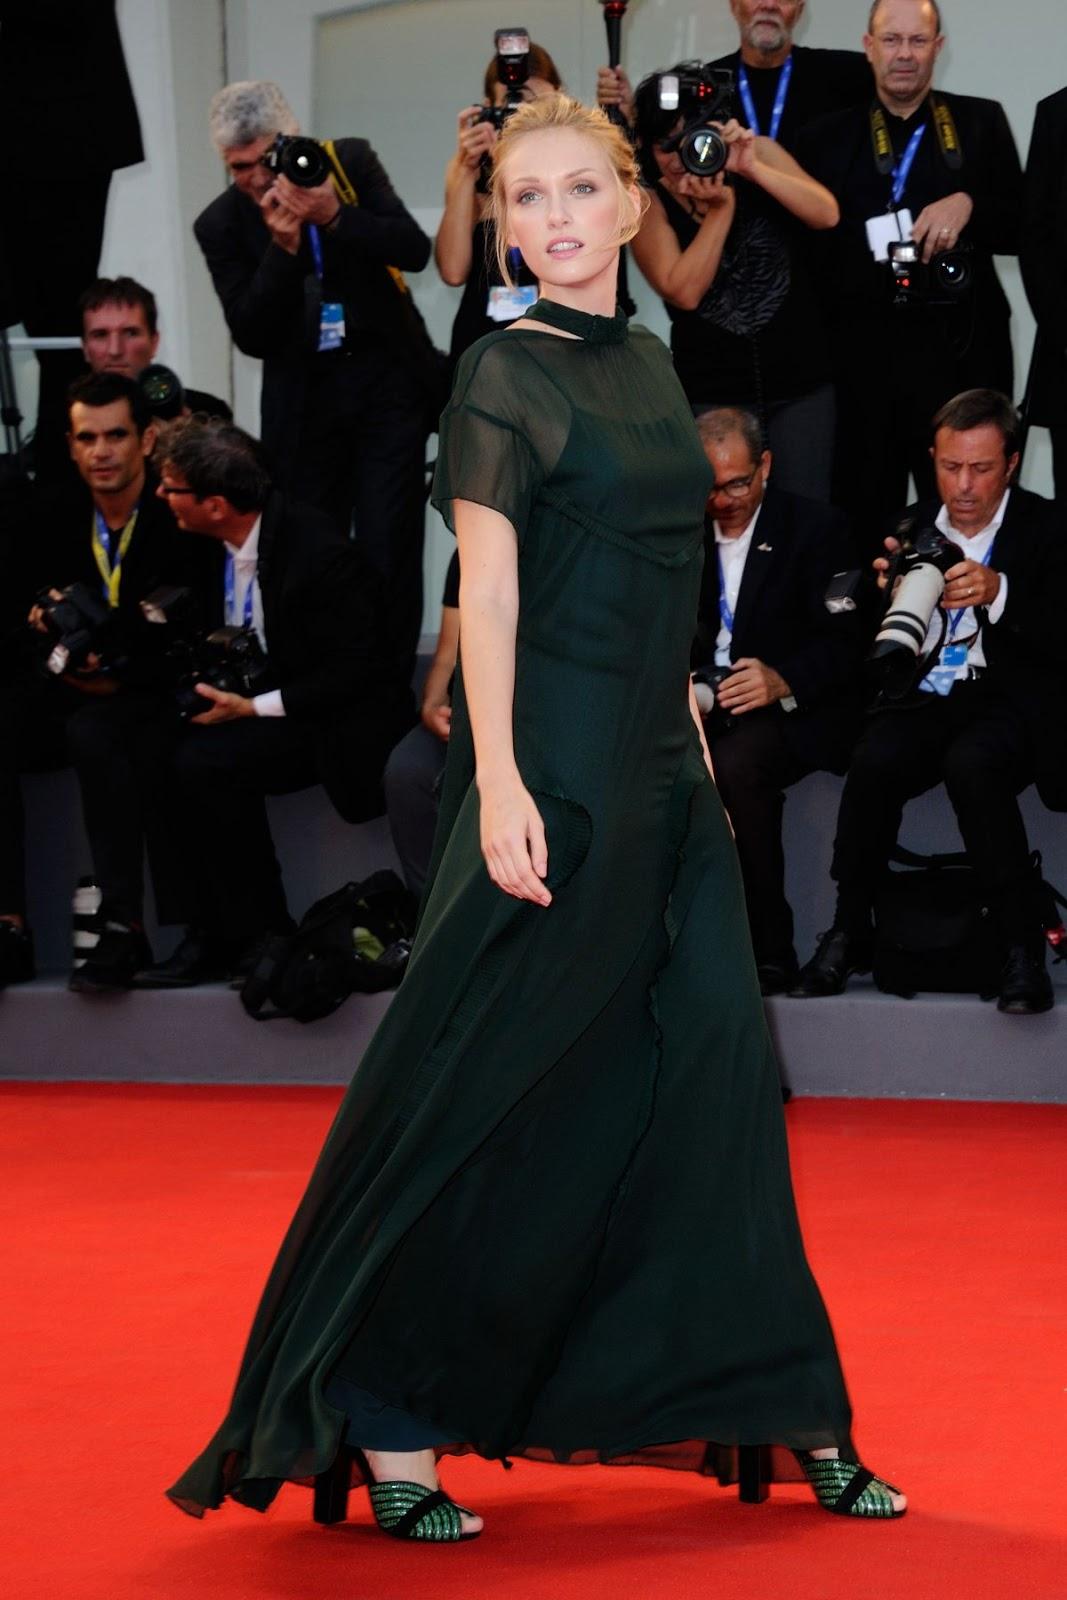 HQ Photos of Caterina Shulha At Hacksaw Ridge Premiere At 2016 Venice Film Festival